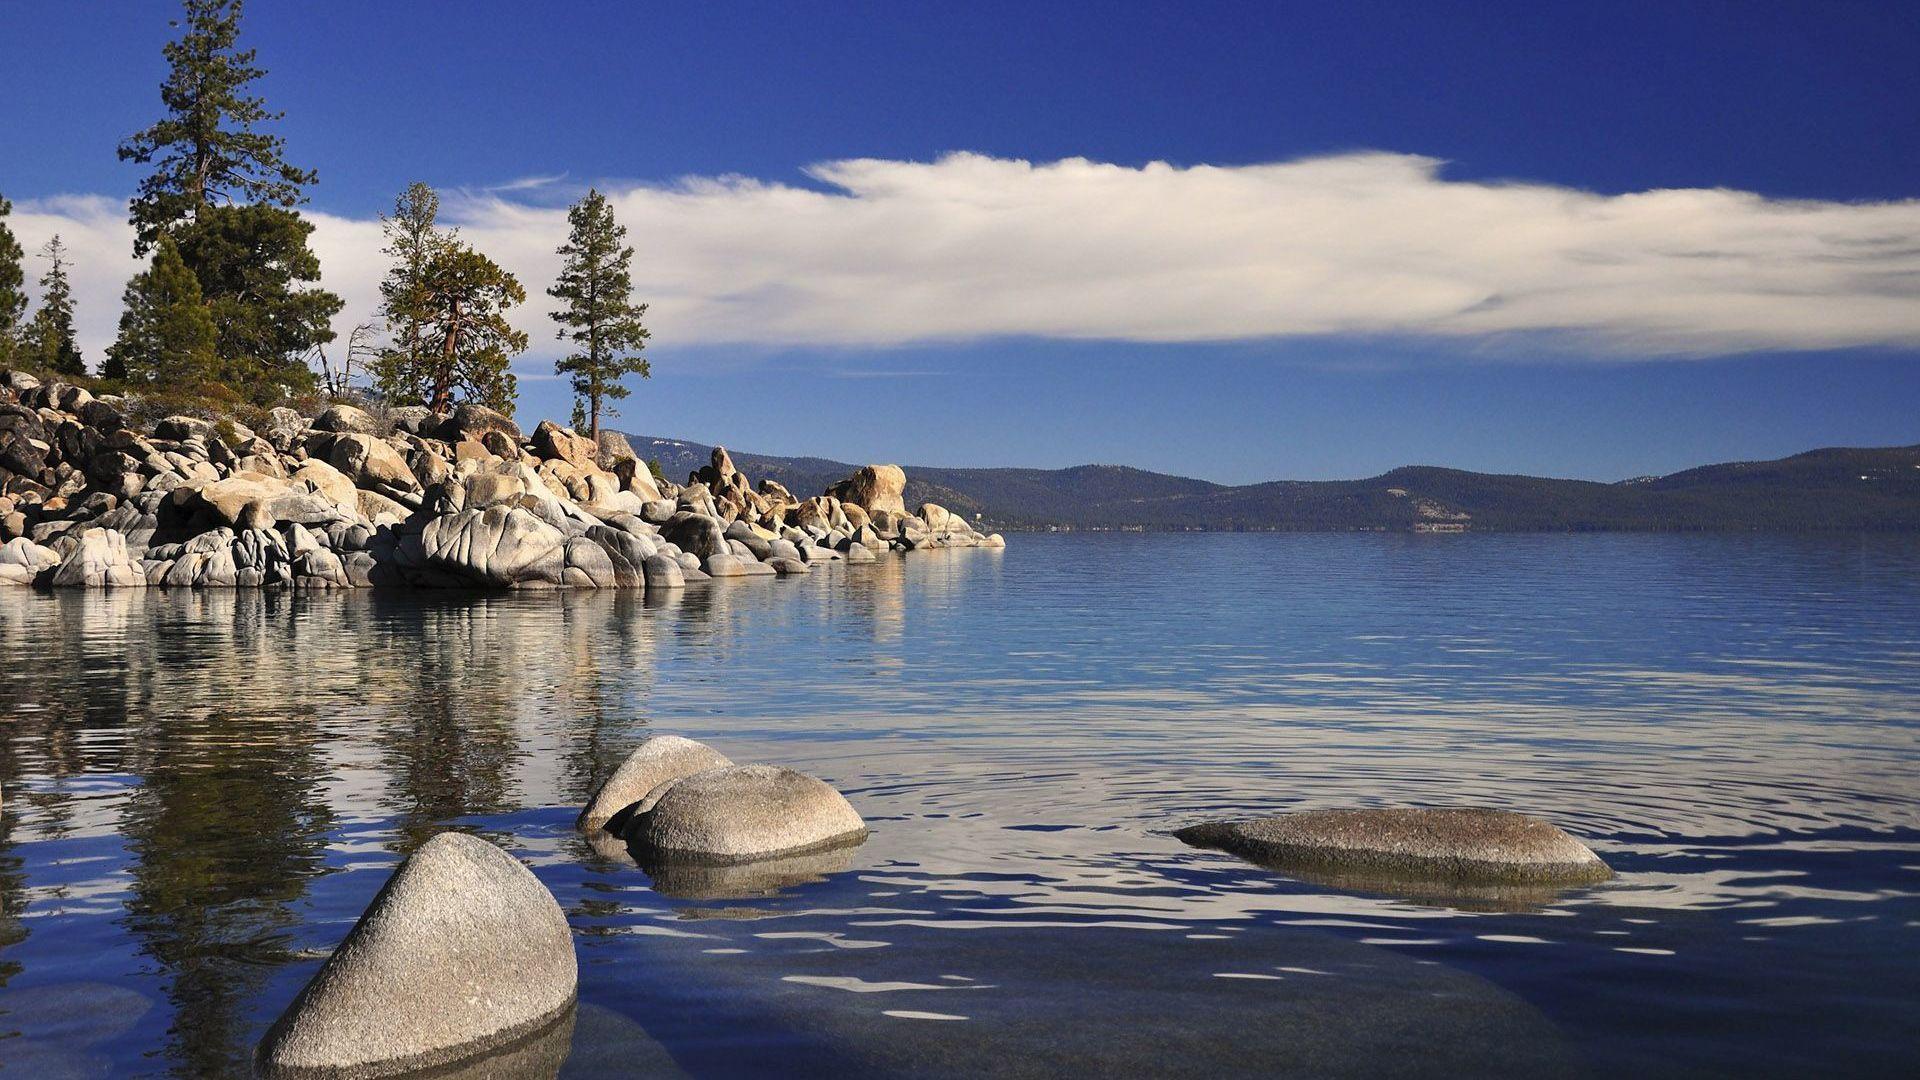 Lake Tahoe desktop background hd